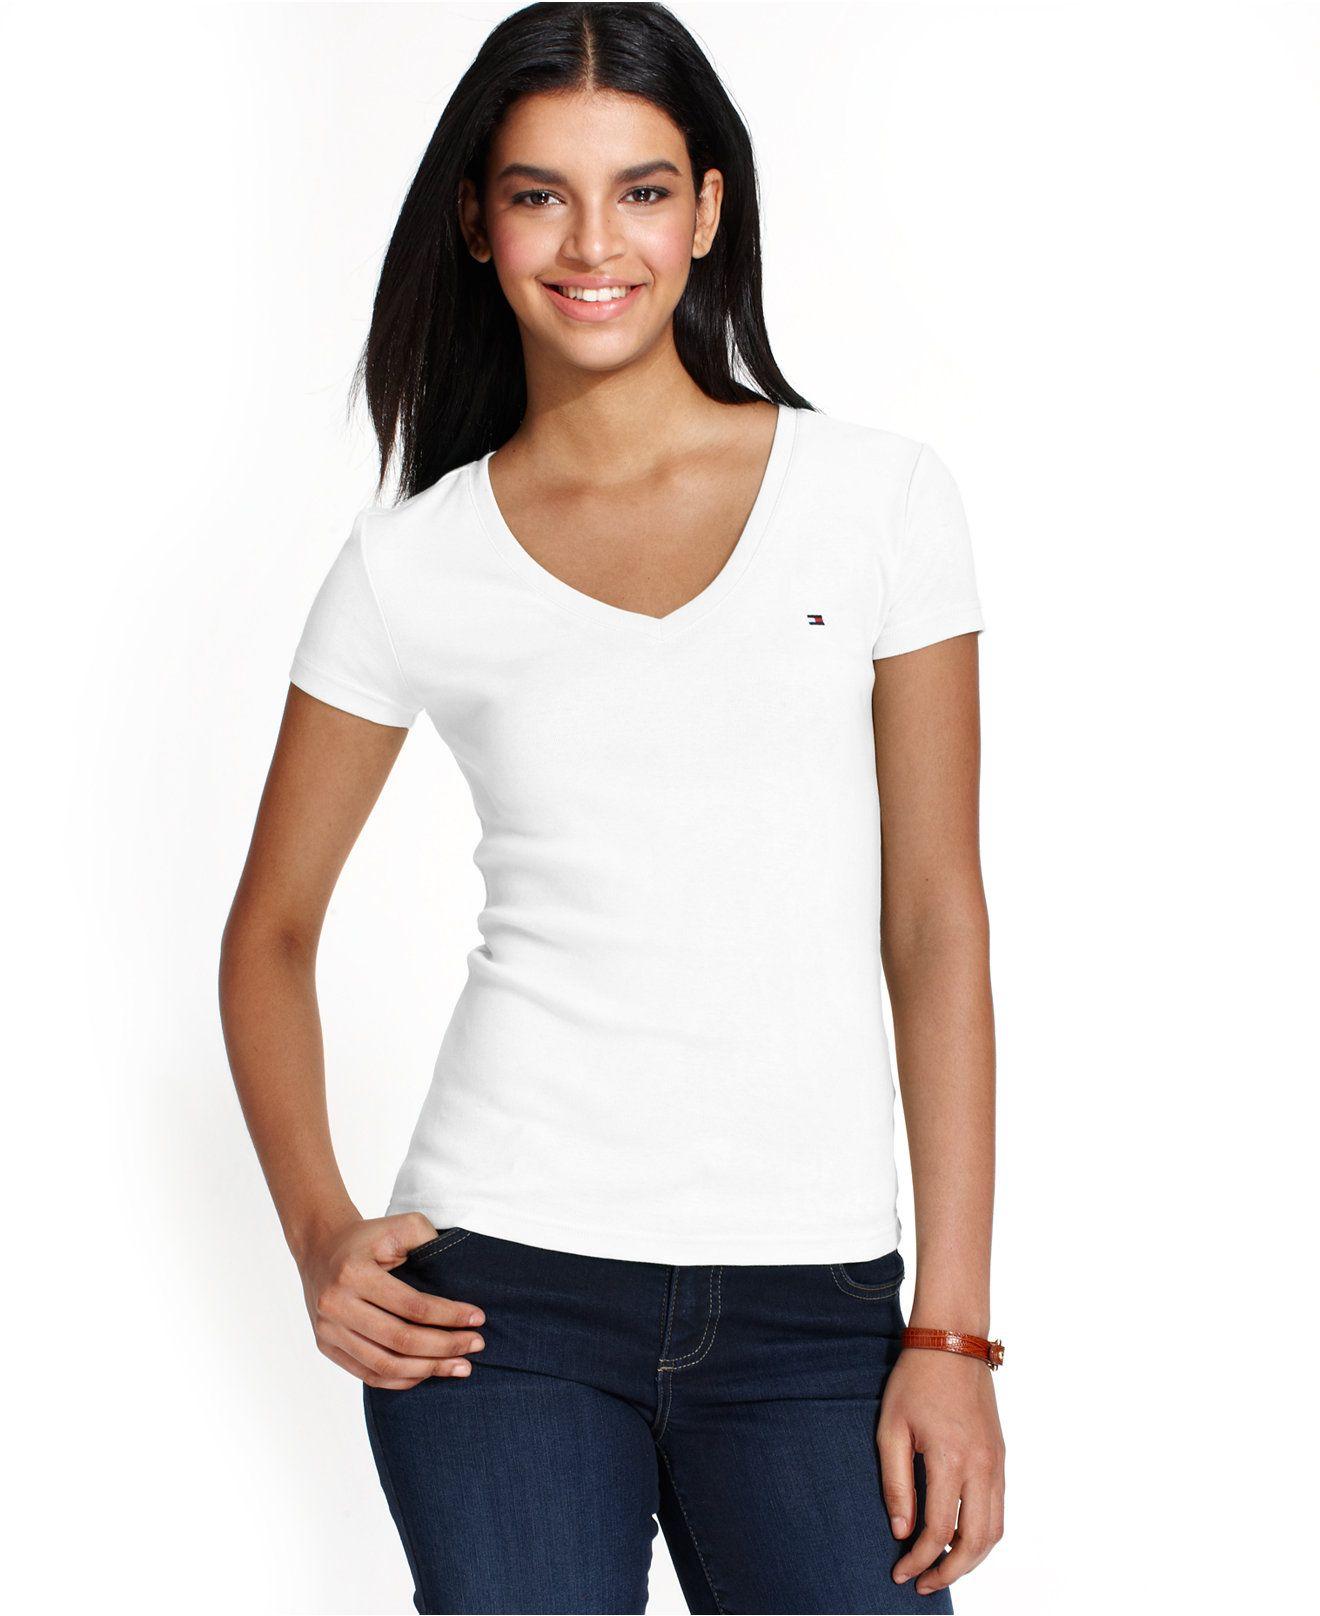 ad6fff7b400 Tommy Hilfiger V-Neck T-Shirt - Tops - Women - Macy s